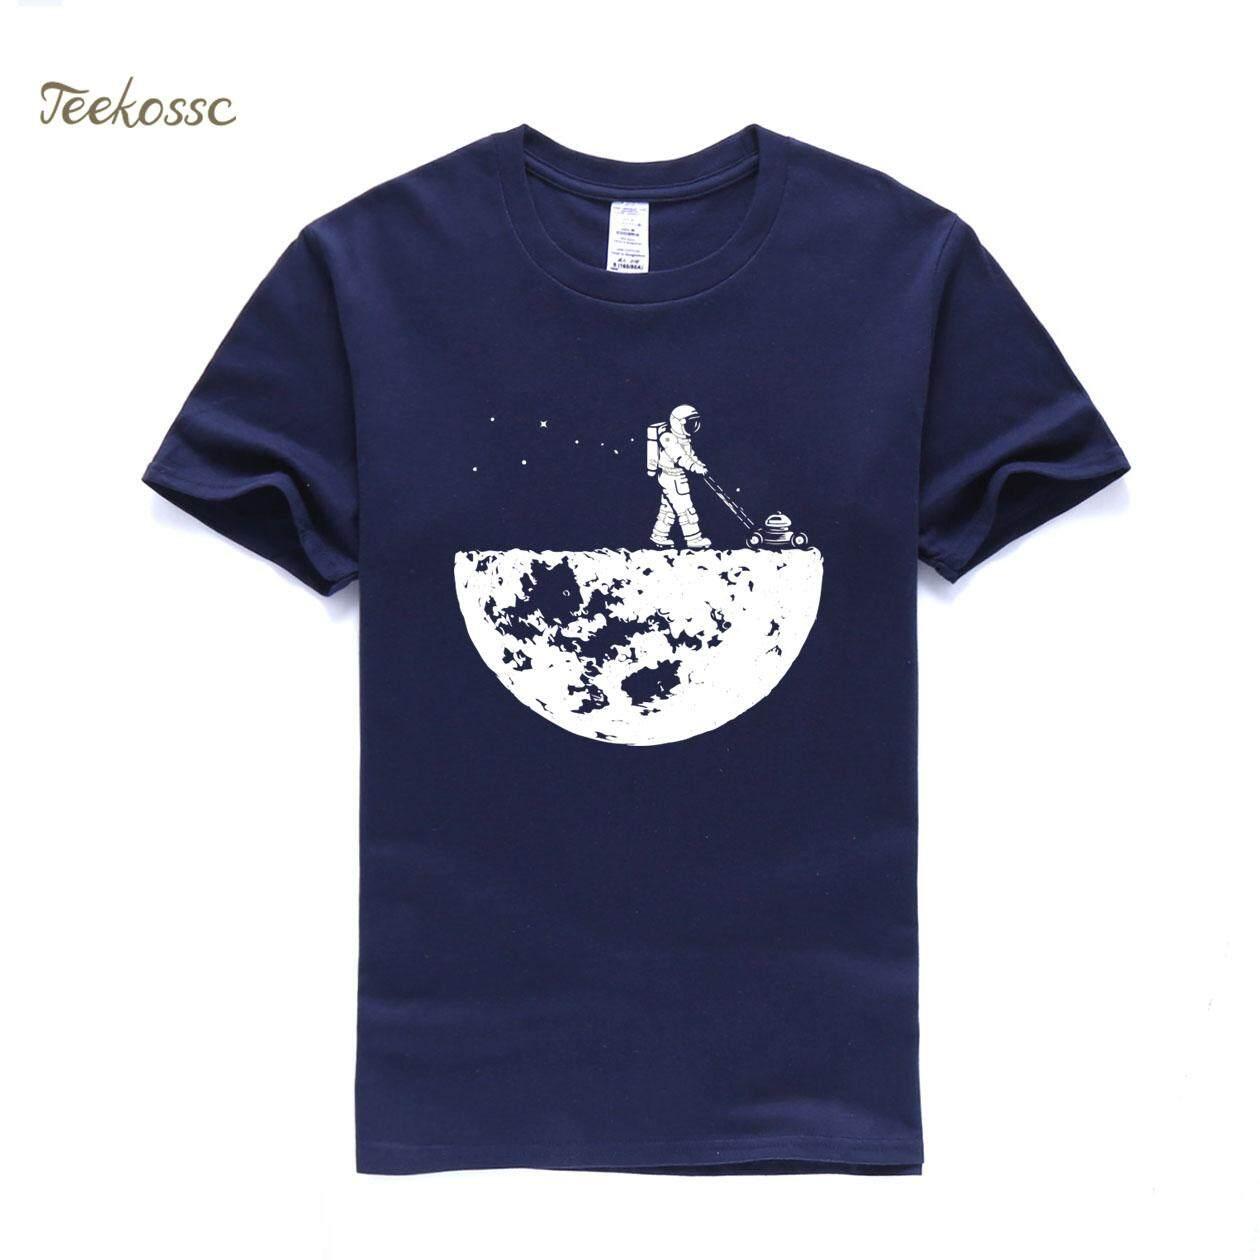 f043a536b76bd Develop The Moon T-Shirt Men 2019 Fashion Summer Tops Tee Cotton Tshirt  Short Sleeve Camiseta Slim Fit Streetwear Black T Shirt